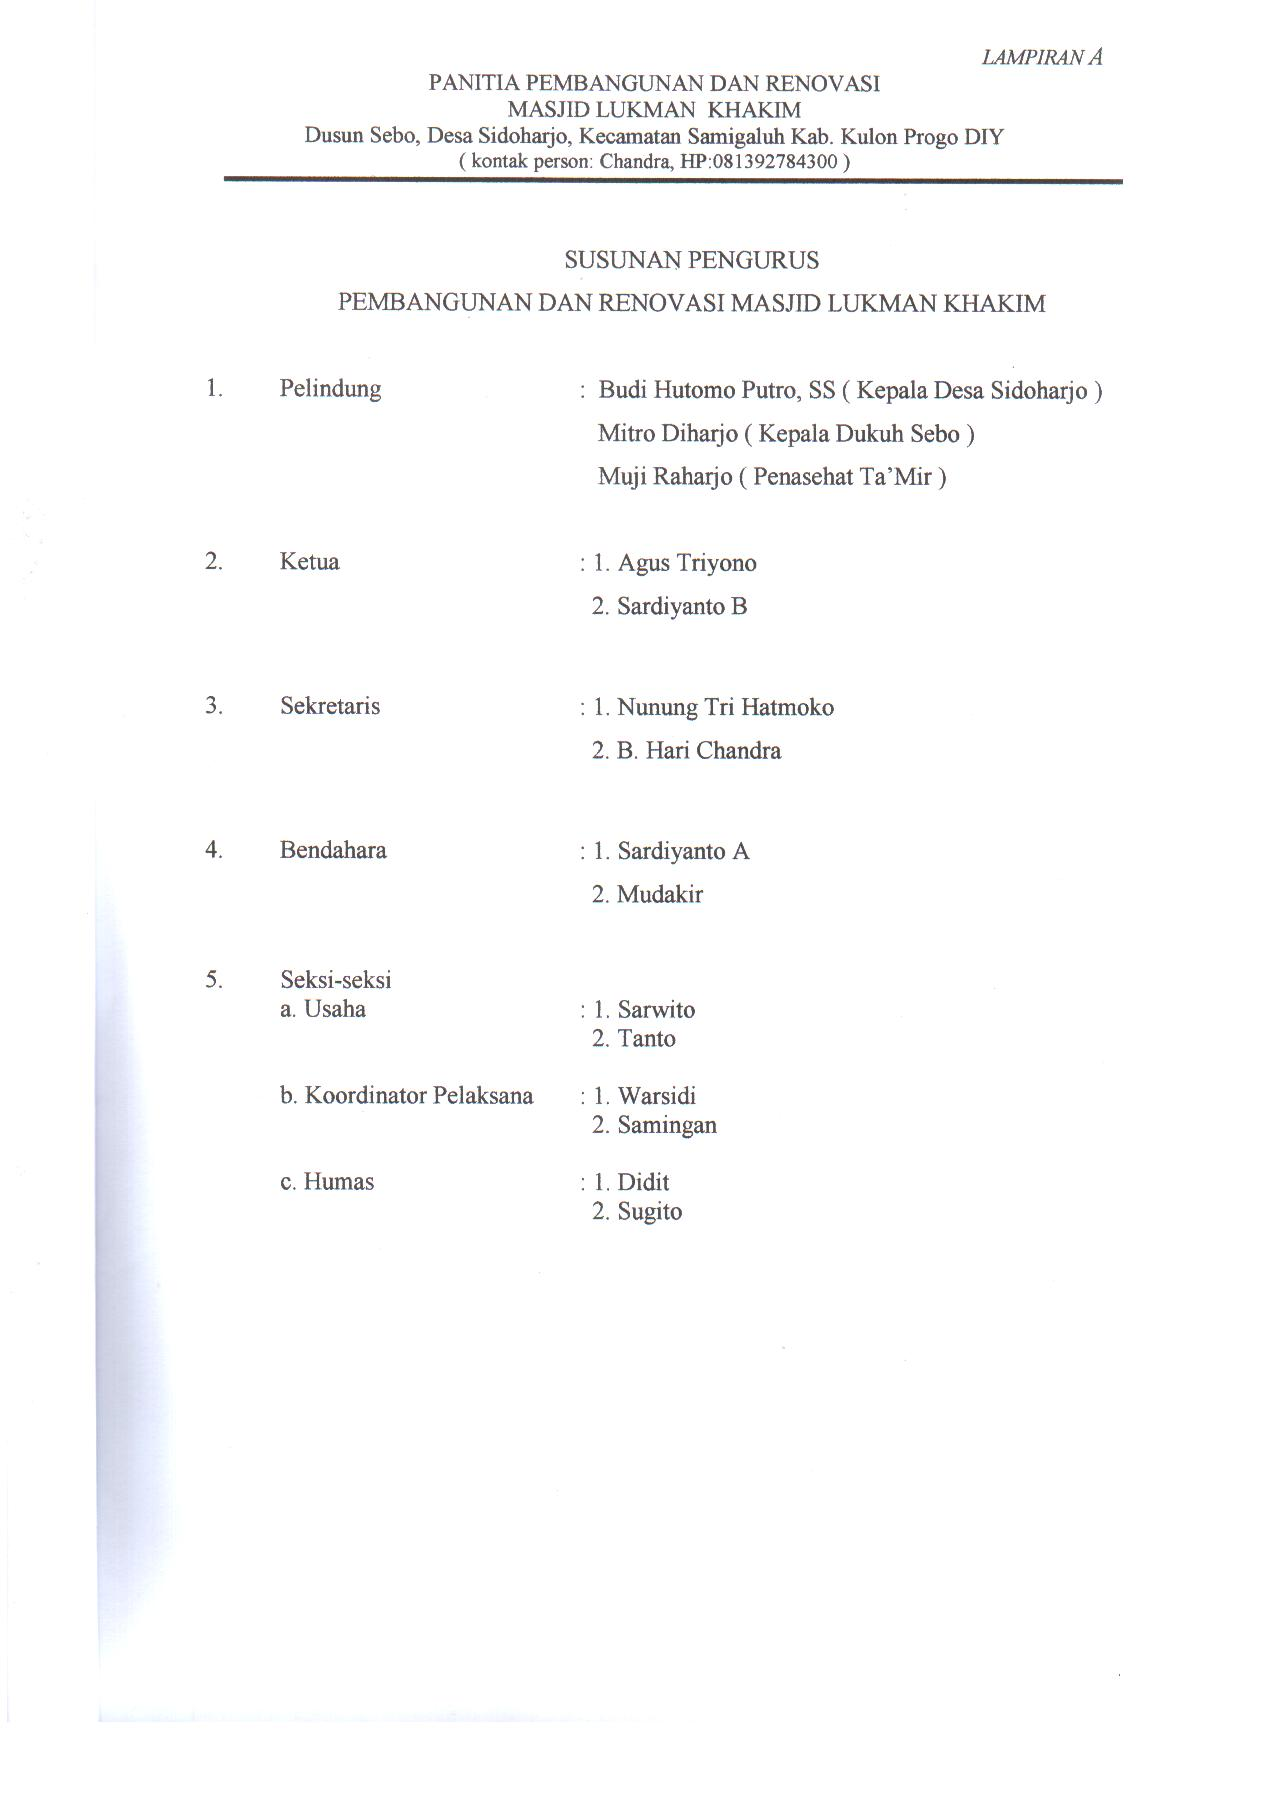 Susunan Pengurus Panitia Pembangunan dan Renovasi Masjid Lukman Khakim